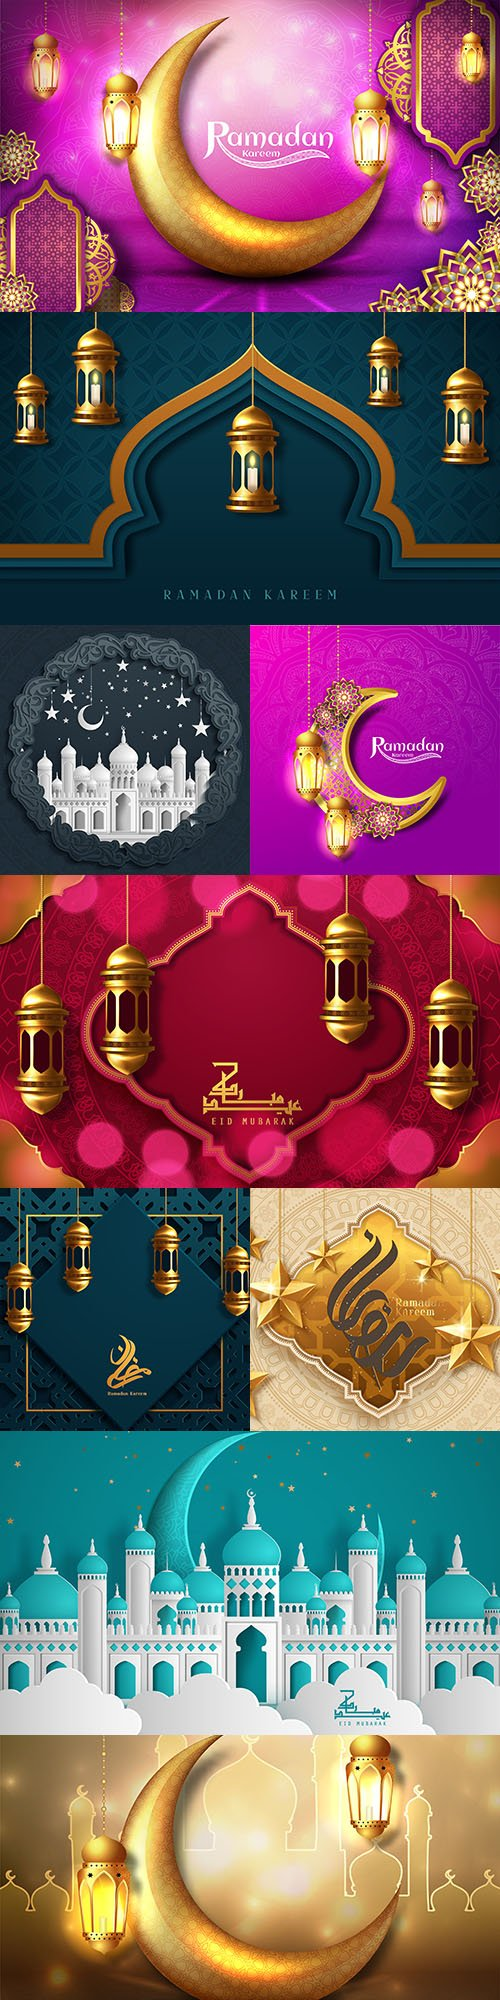 Ramadan Kareem Arab calligraphy design illustrations 18